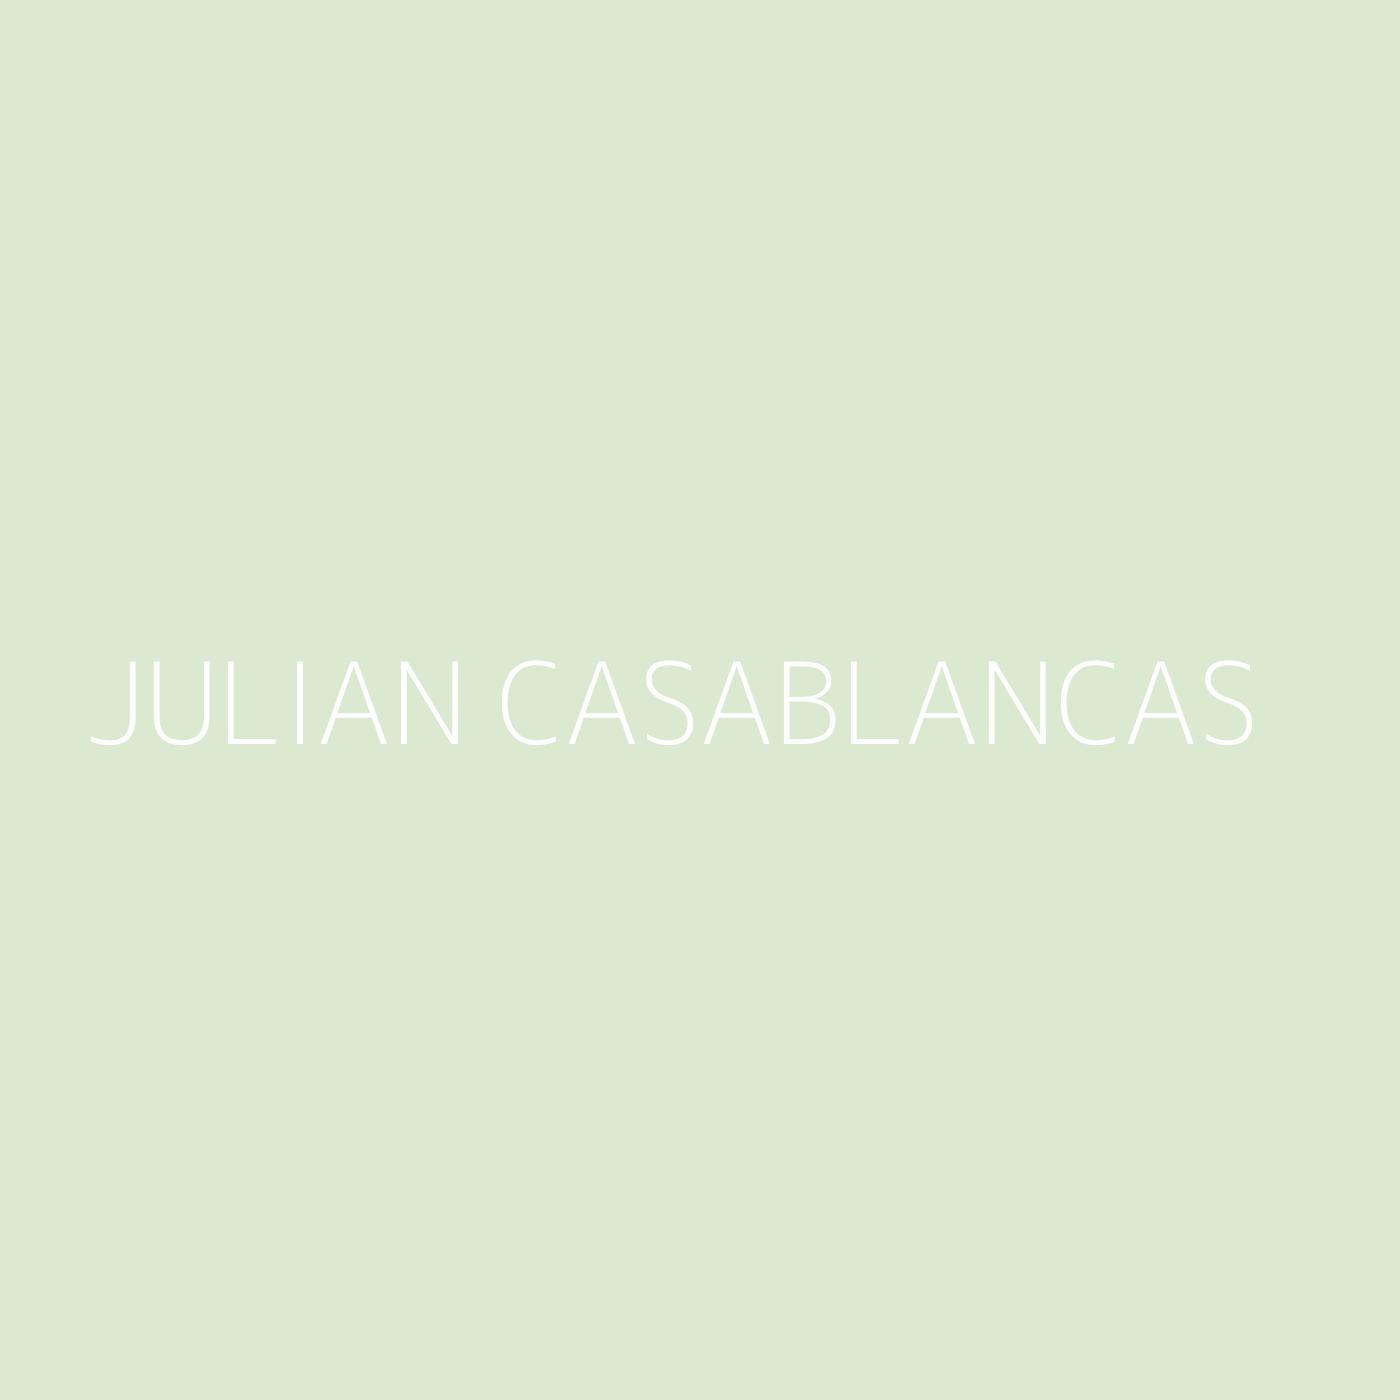 Julian Casablancas Playlist Artwork